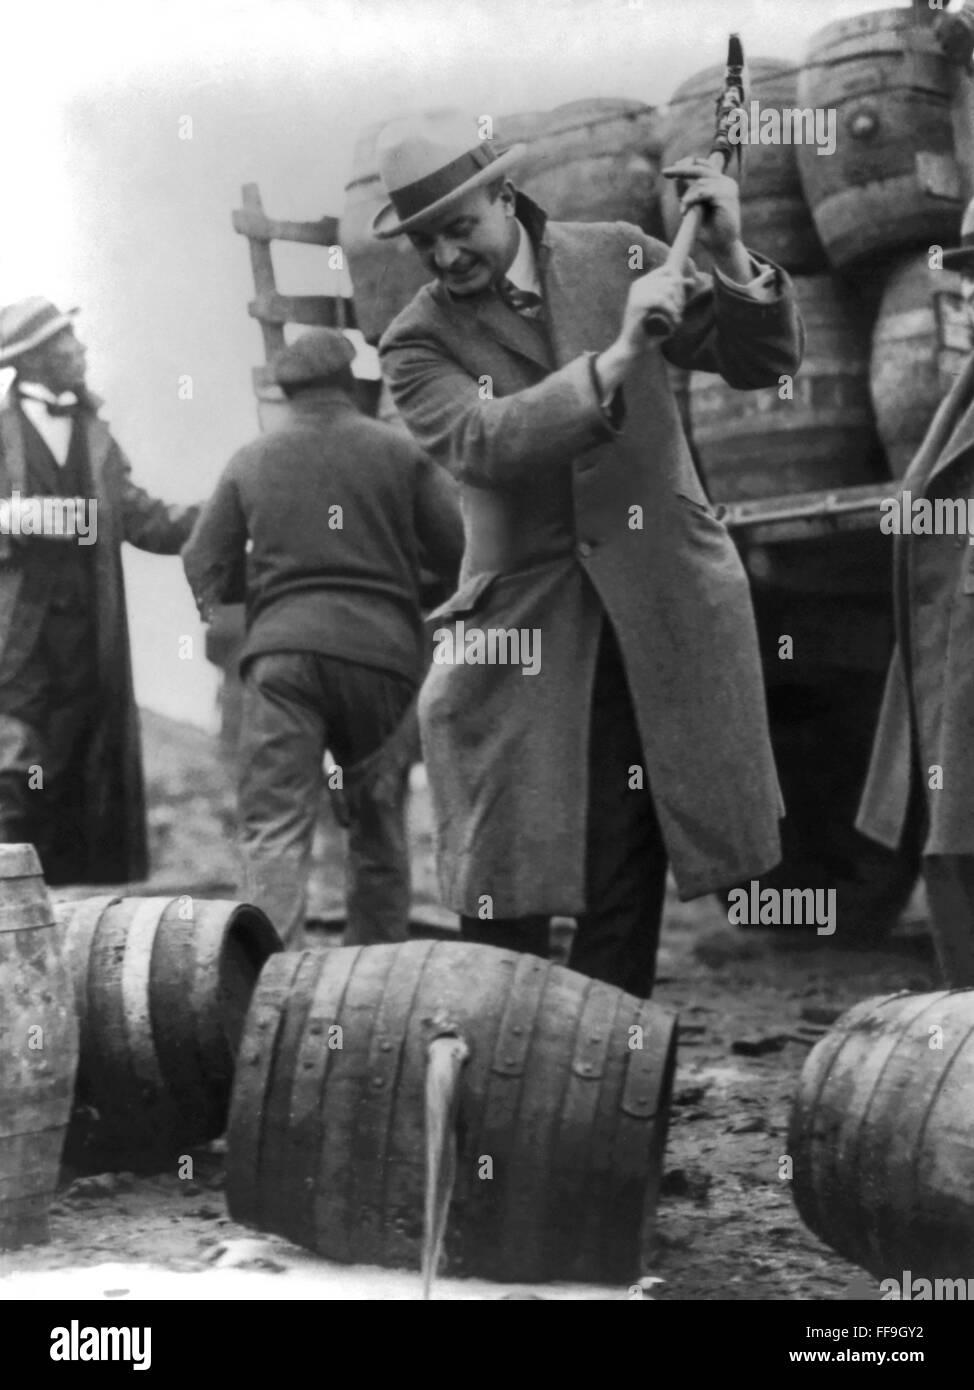 Verbot, USA. Fässer Bier, zu zerstören c.1924 Stockbild